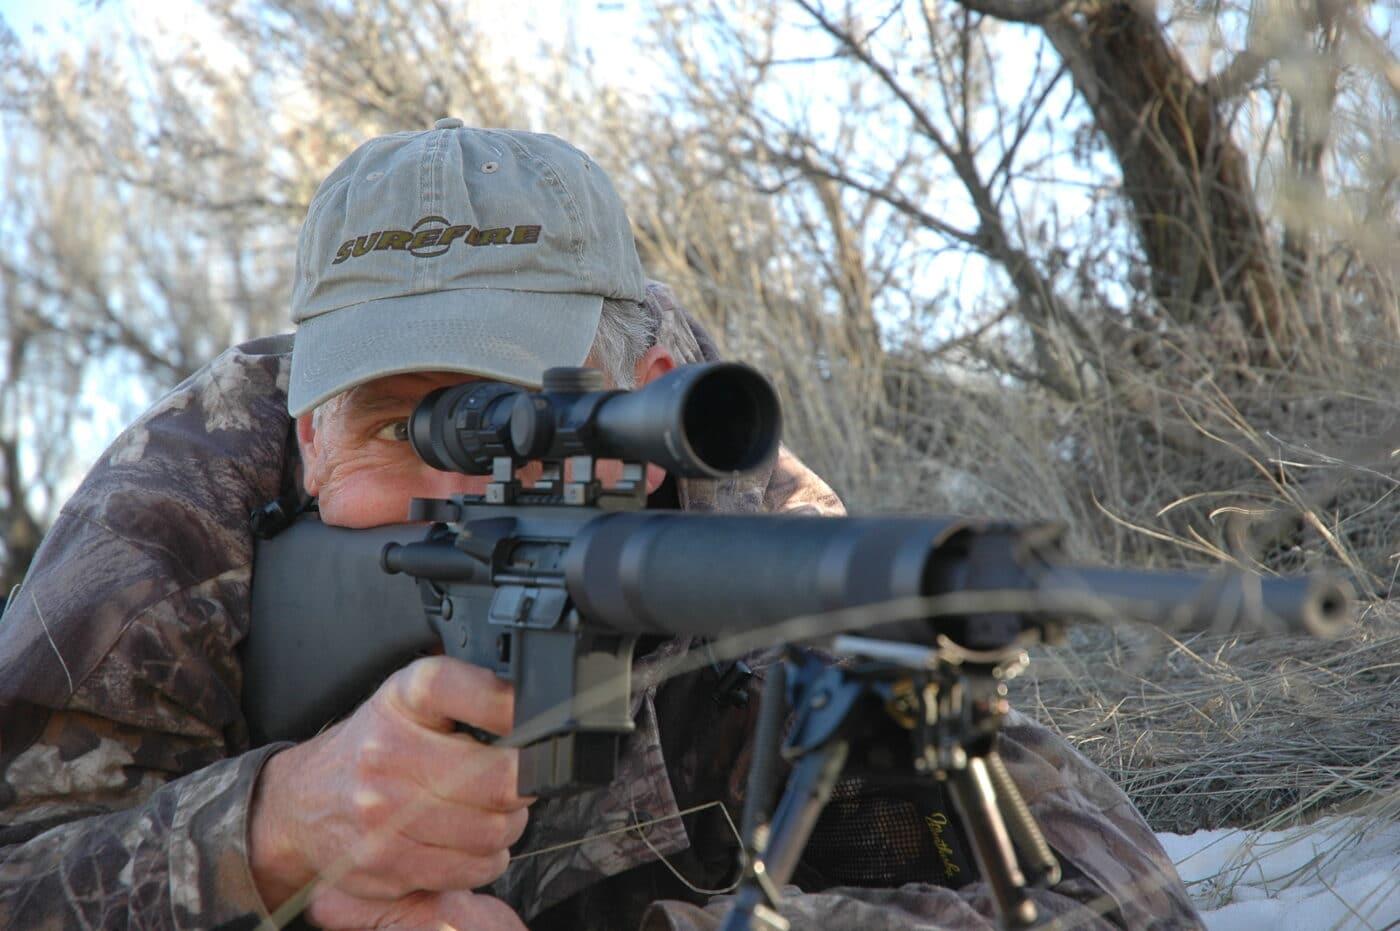 Man using .223 for hunting deer